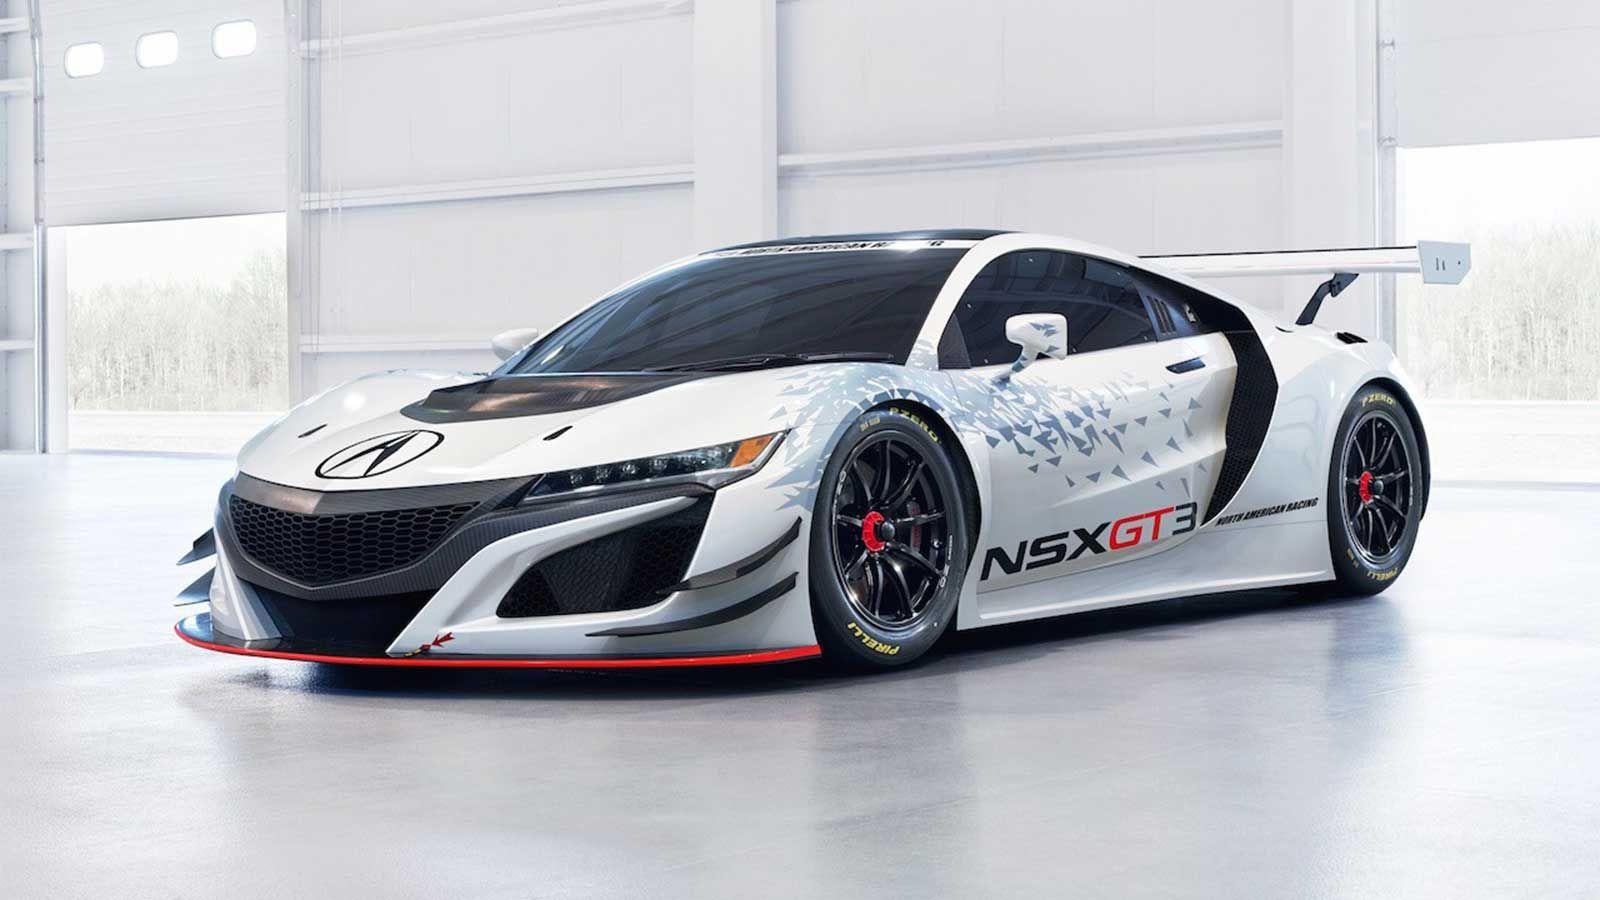 ACURA NSX GT3 RACECAR Nsx, Acura nsx, Acura nsx gt3